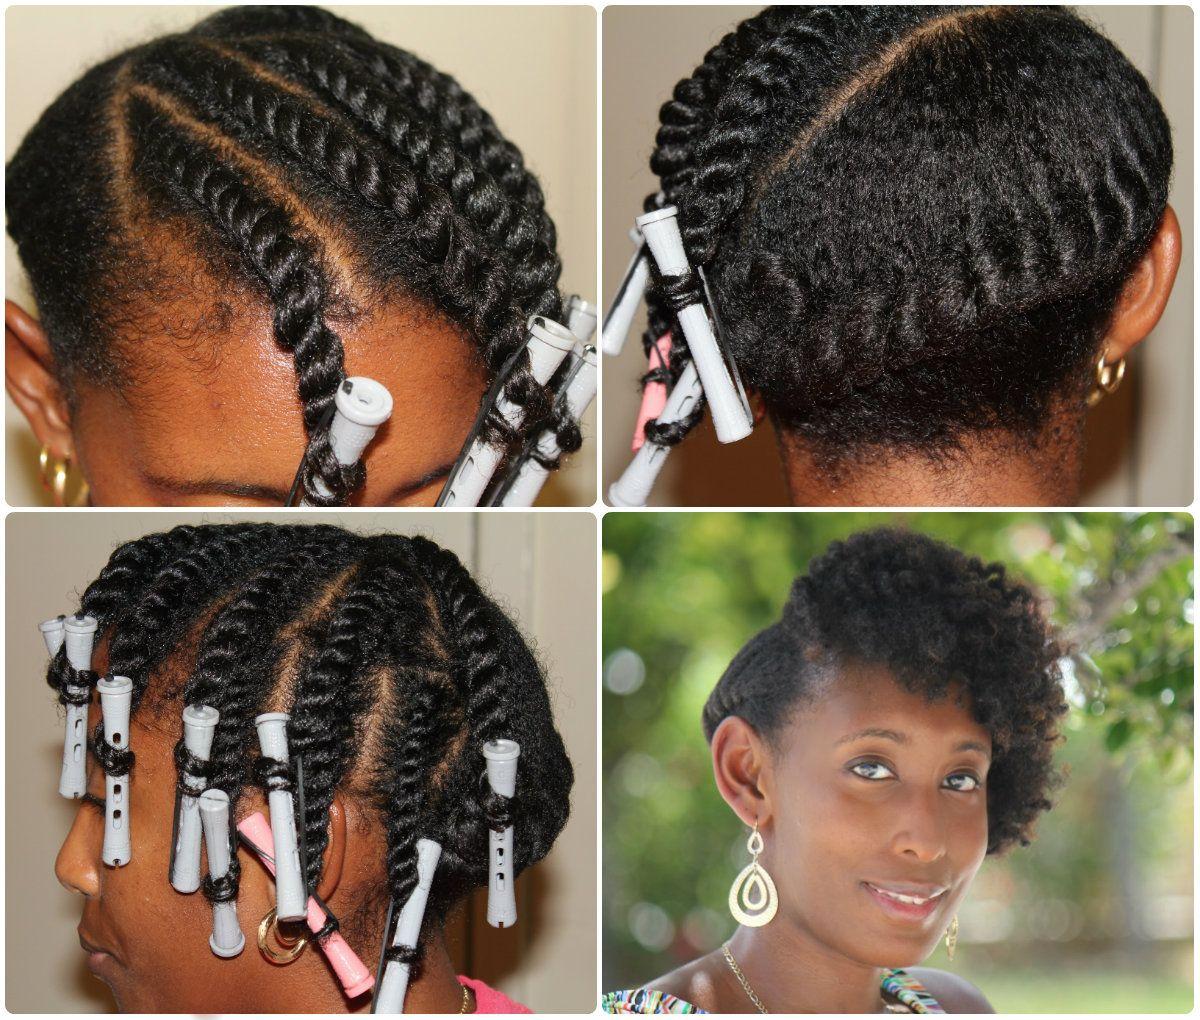 Kinkycurlyrelaxedextensions board haircare hairstyles